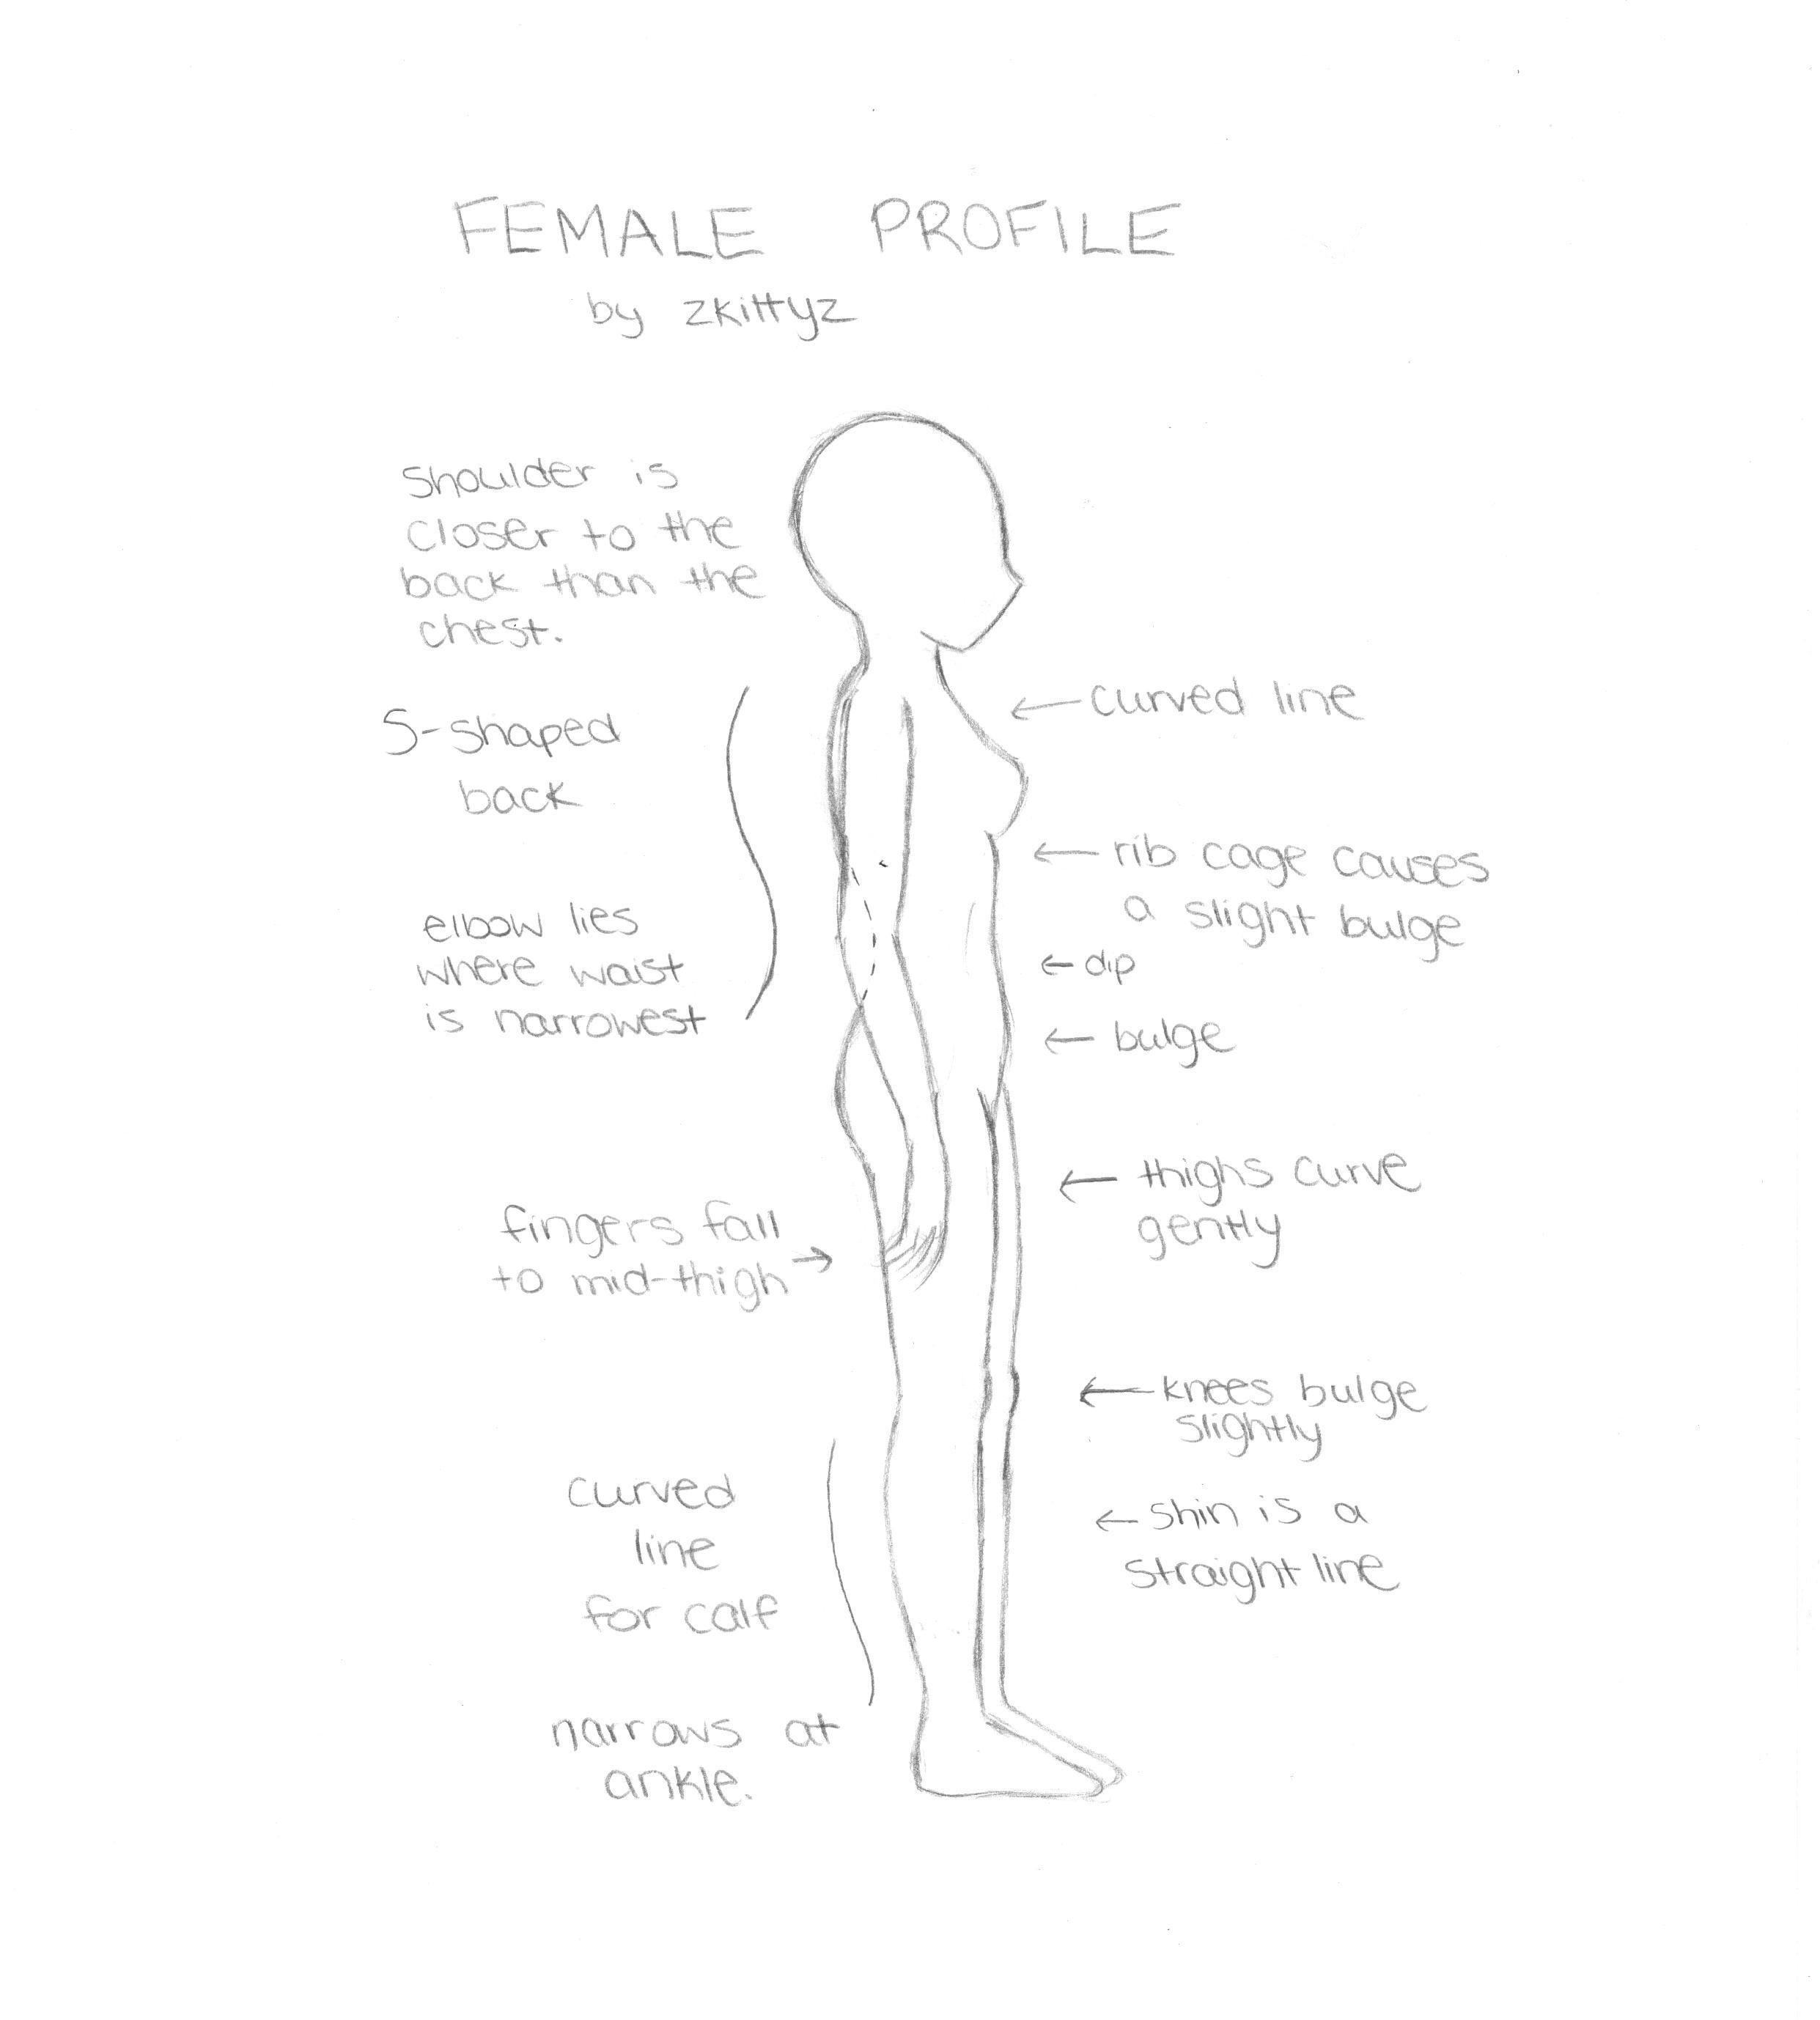 How to draw a female profile cartoon girl drawing cartoon body anime girl drawings